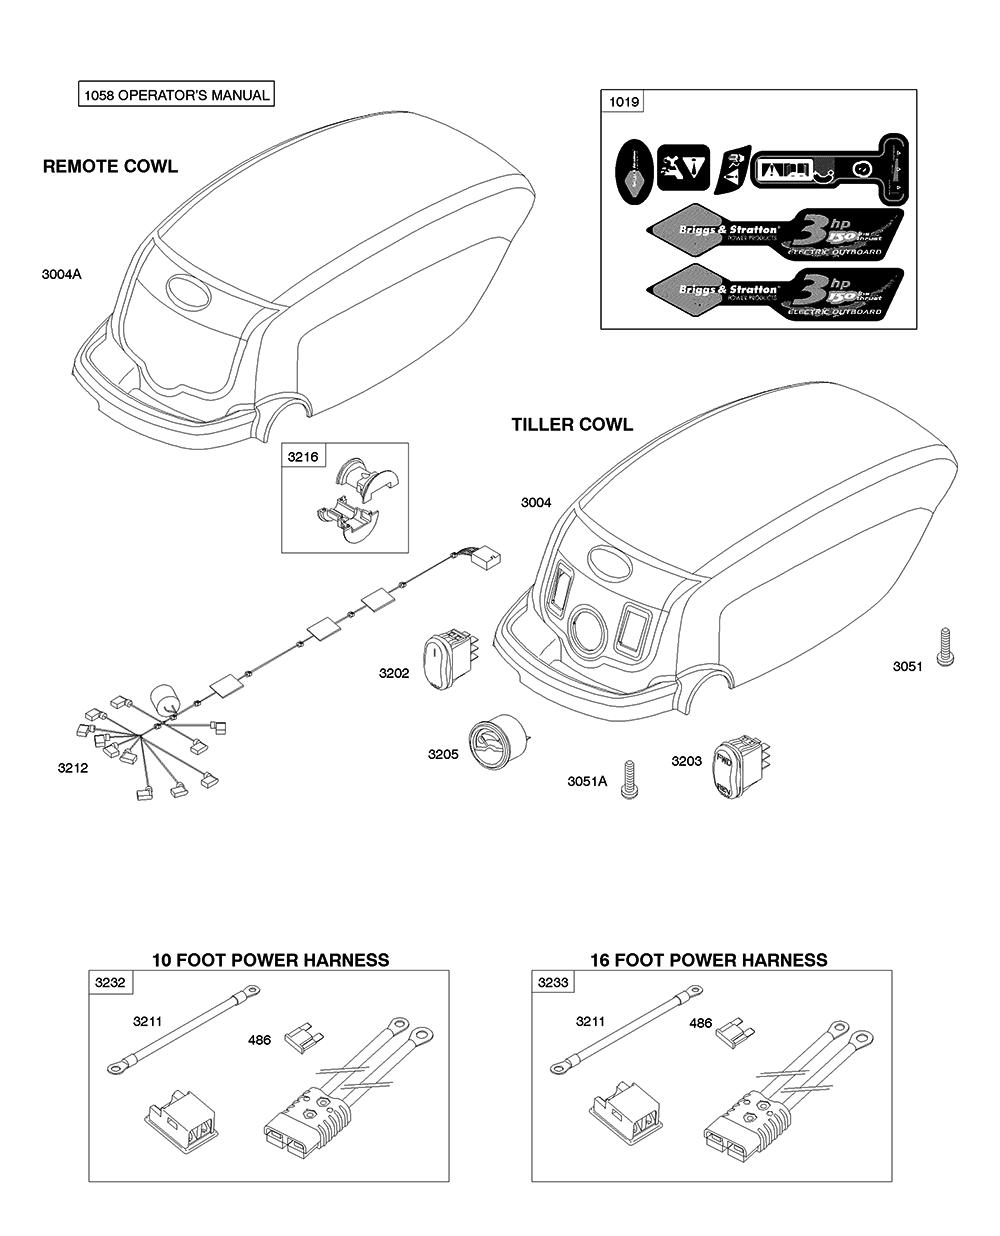 AA0202-(0101)-BriggsandStratton-PB-1Break Down